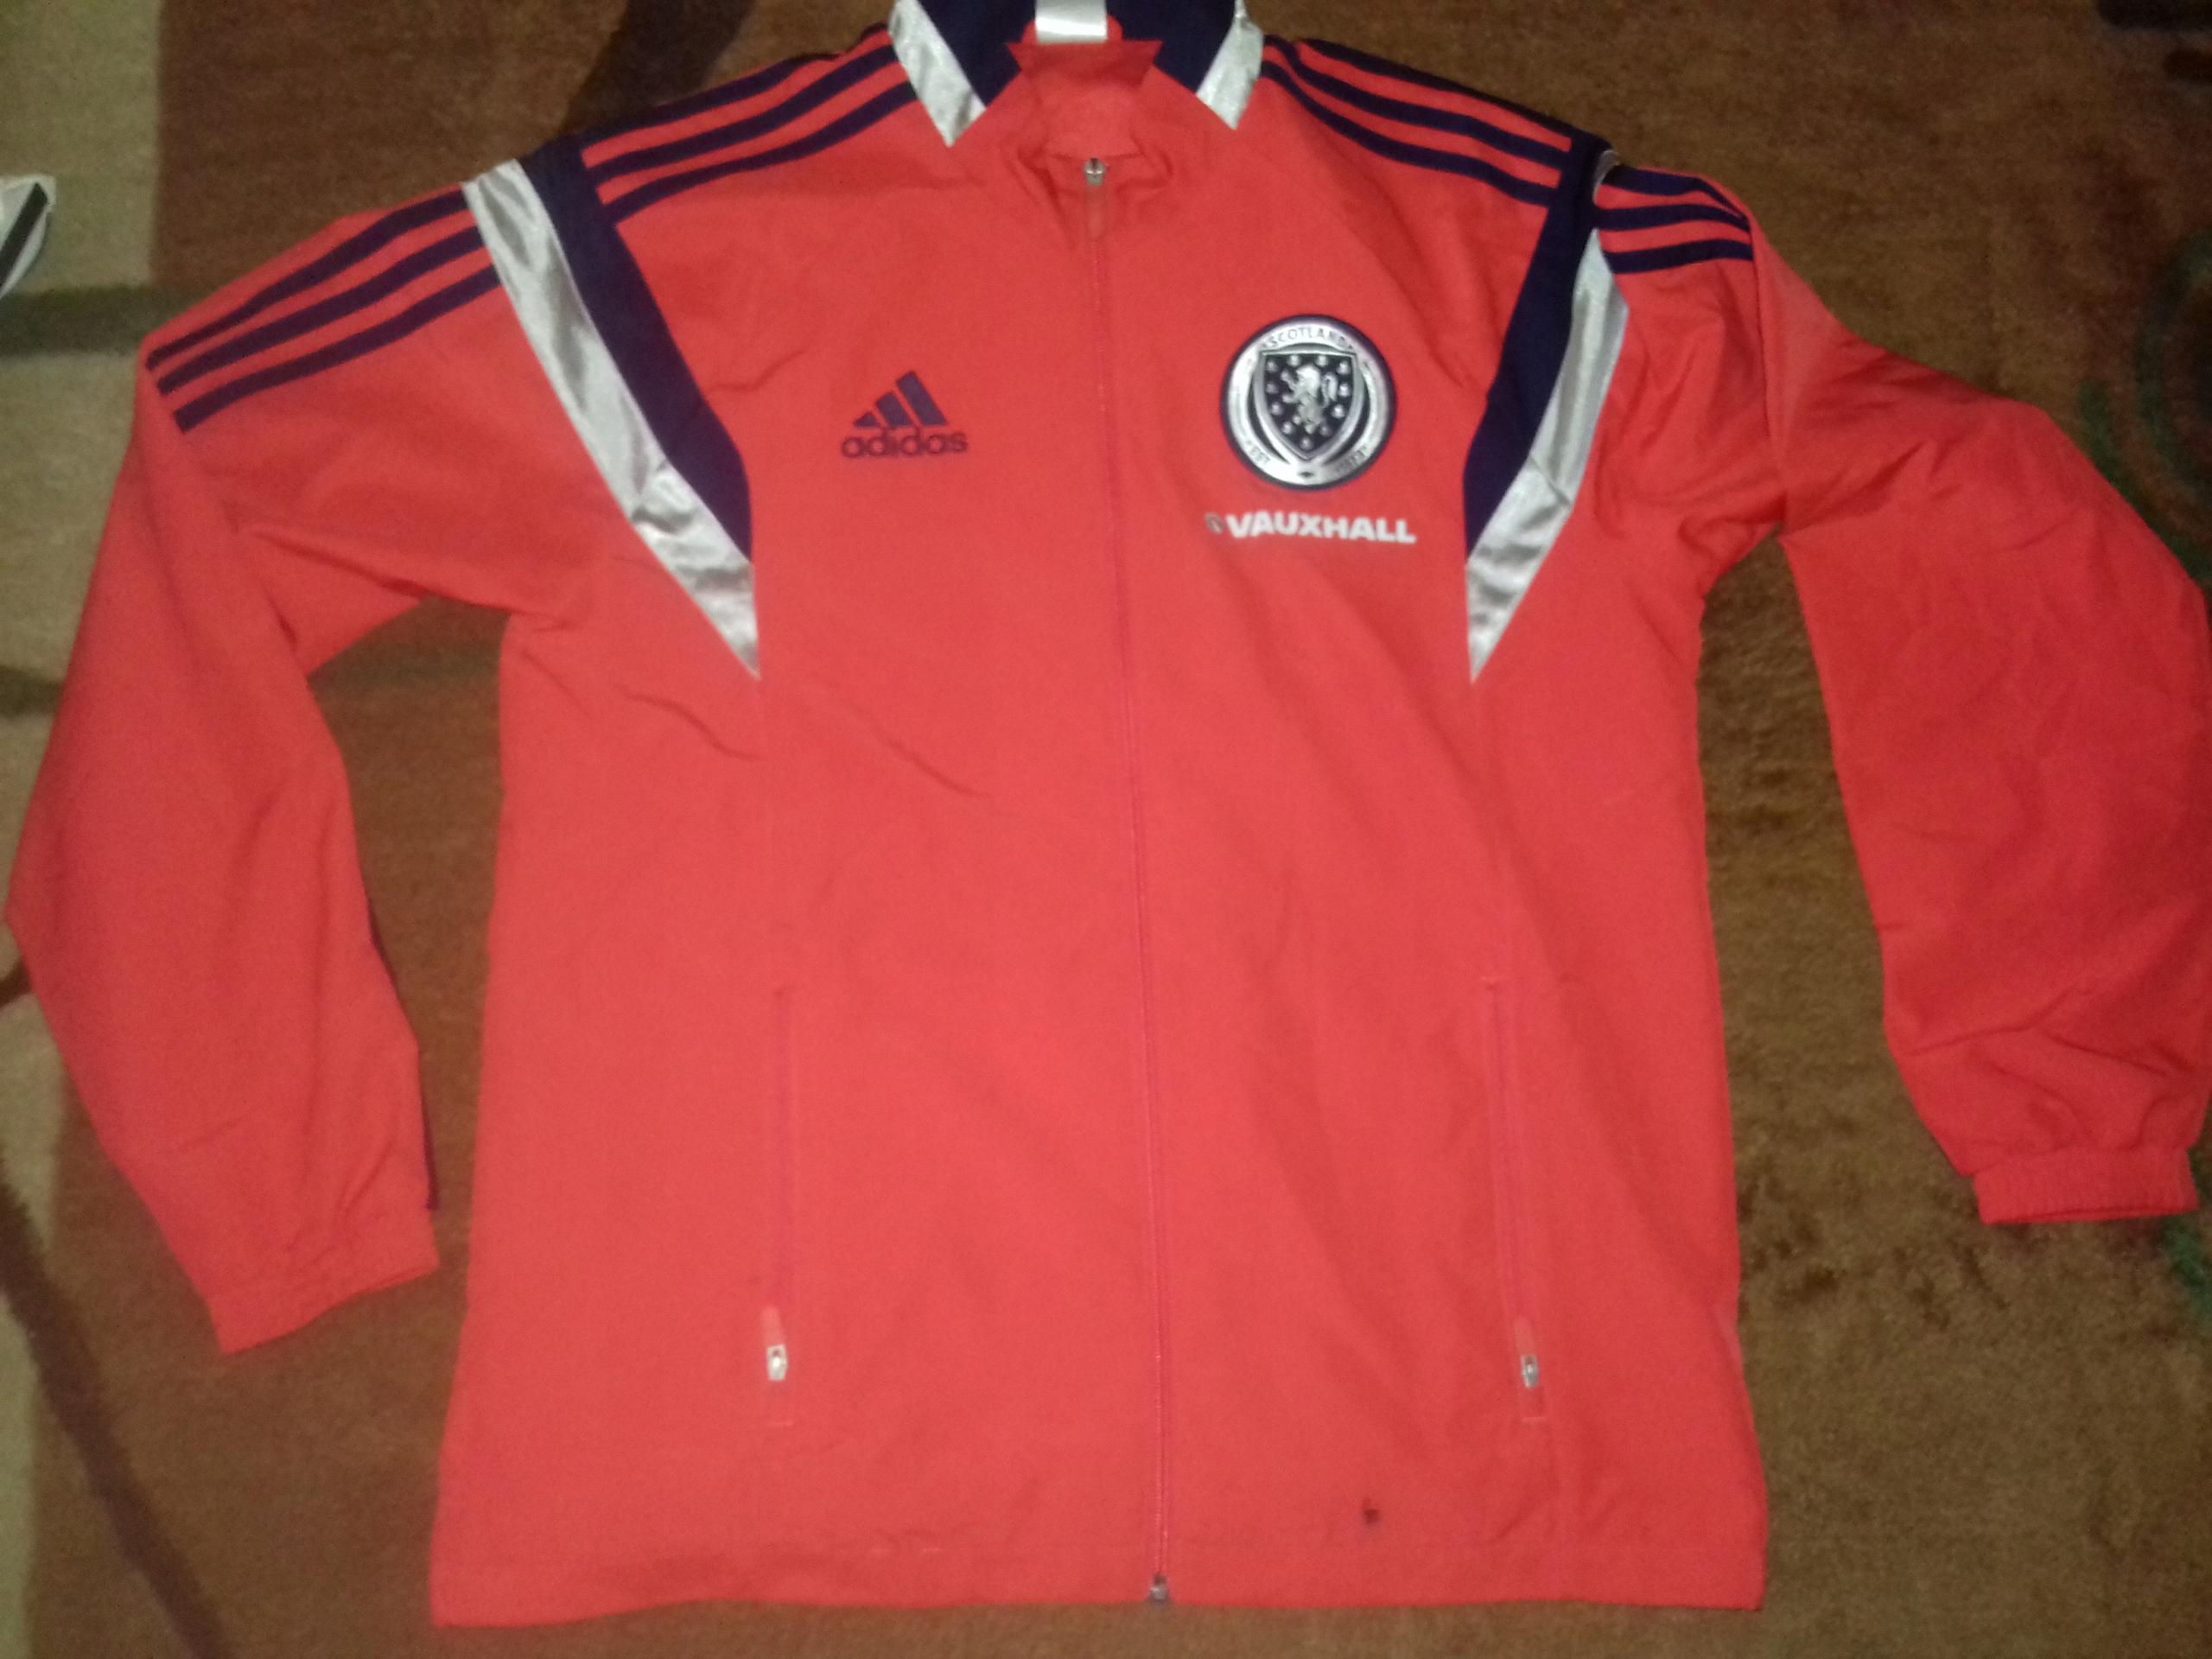 SZKOCJA 2013/14 Adidas bluza M